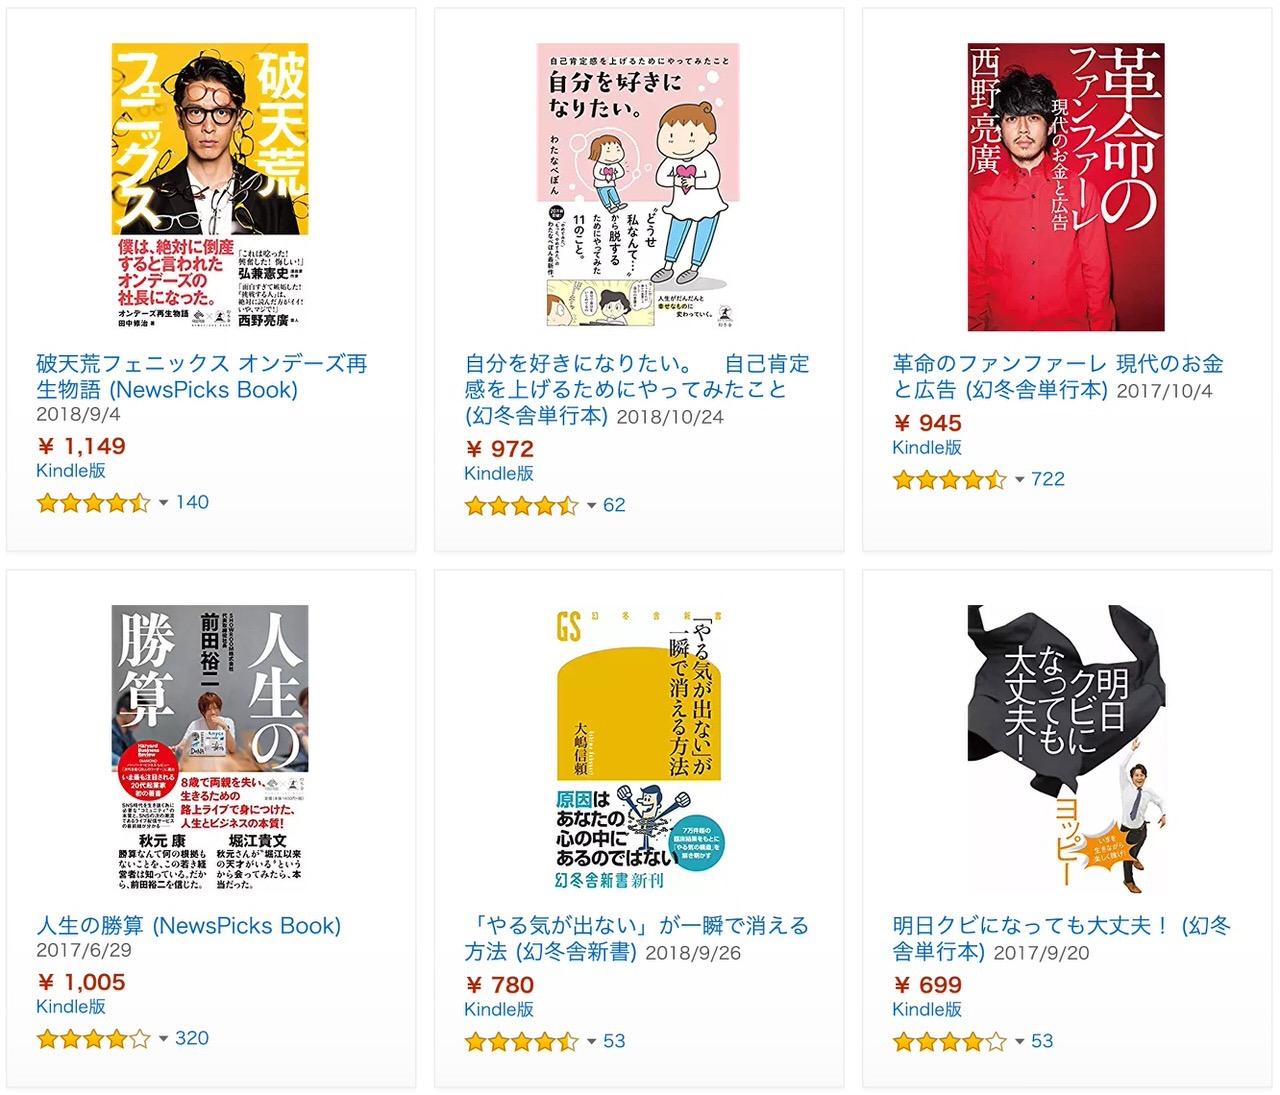 【Kindleセール】3,000冊以上が対象!50%ポイント還元「冬の幻冬舎セール」(1/8まで)